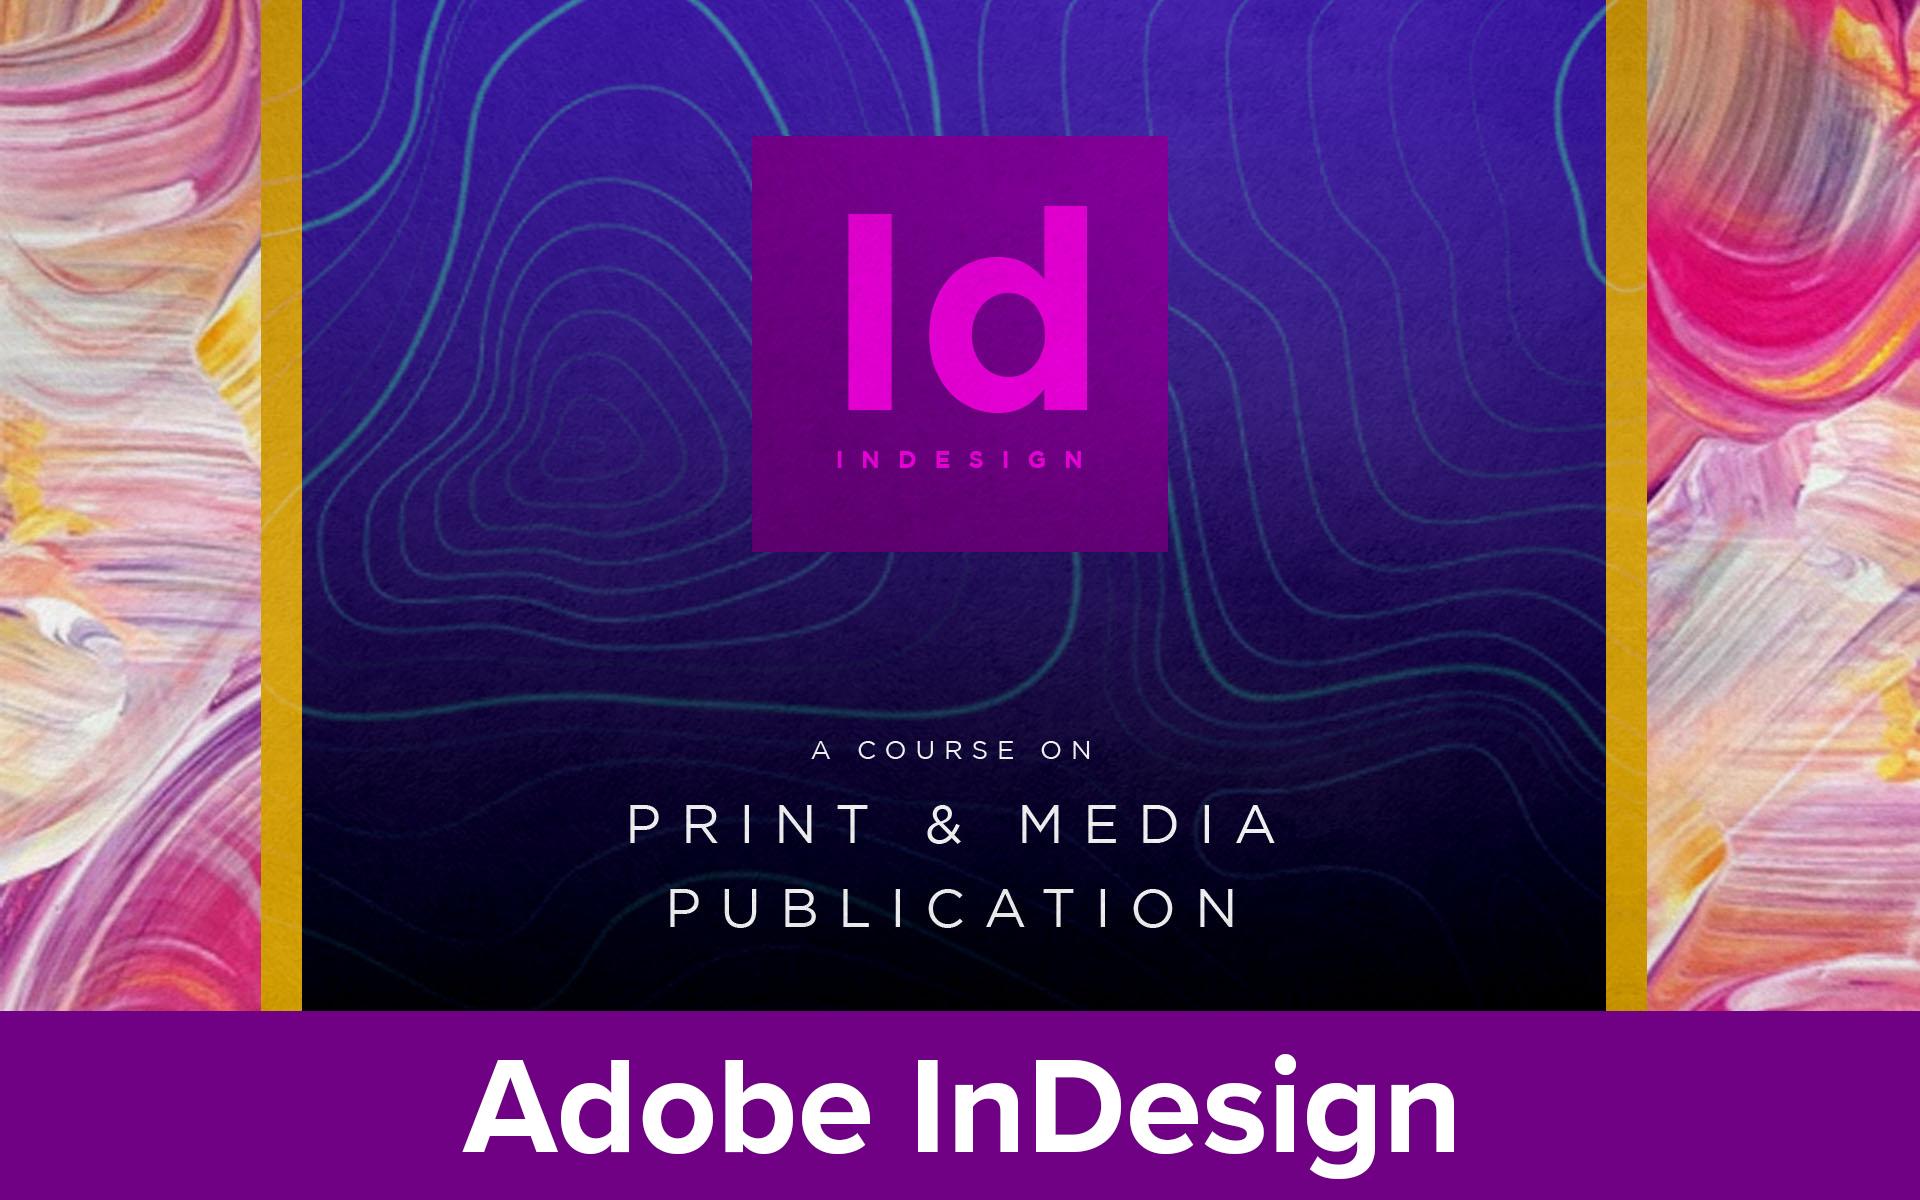 Adobe InDesign CC18|19|20 course image